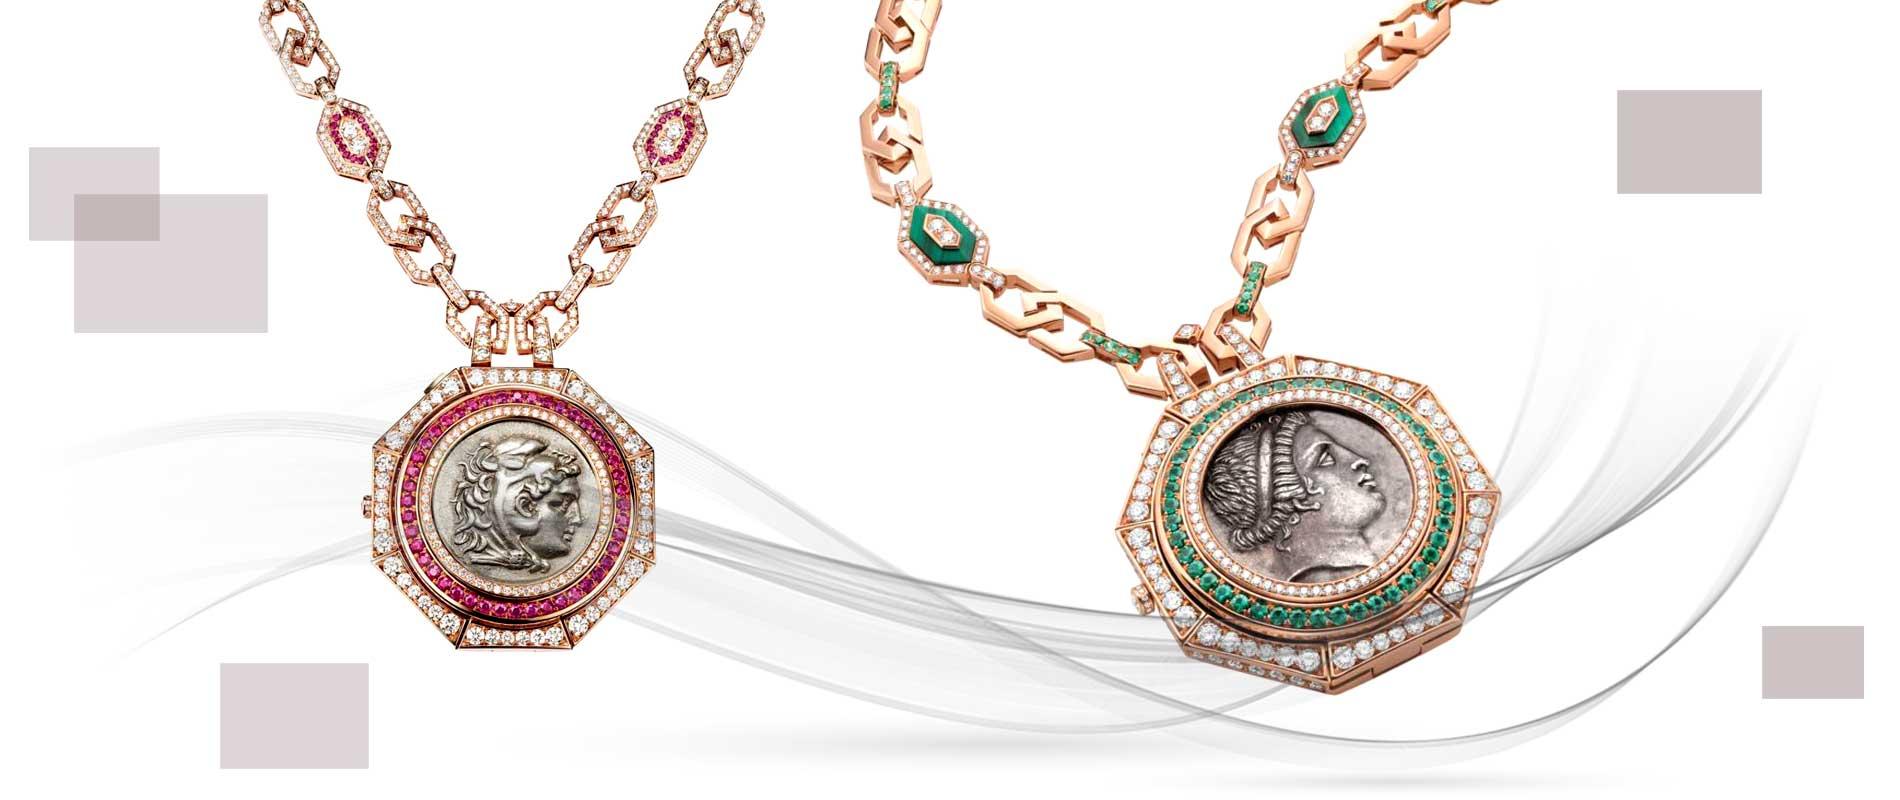 Jewellery designers 762 1 - استفاده از مواد اولیه غیر متعارف در جواهر سازی